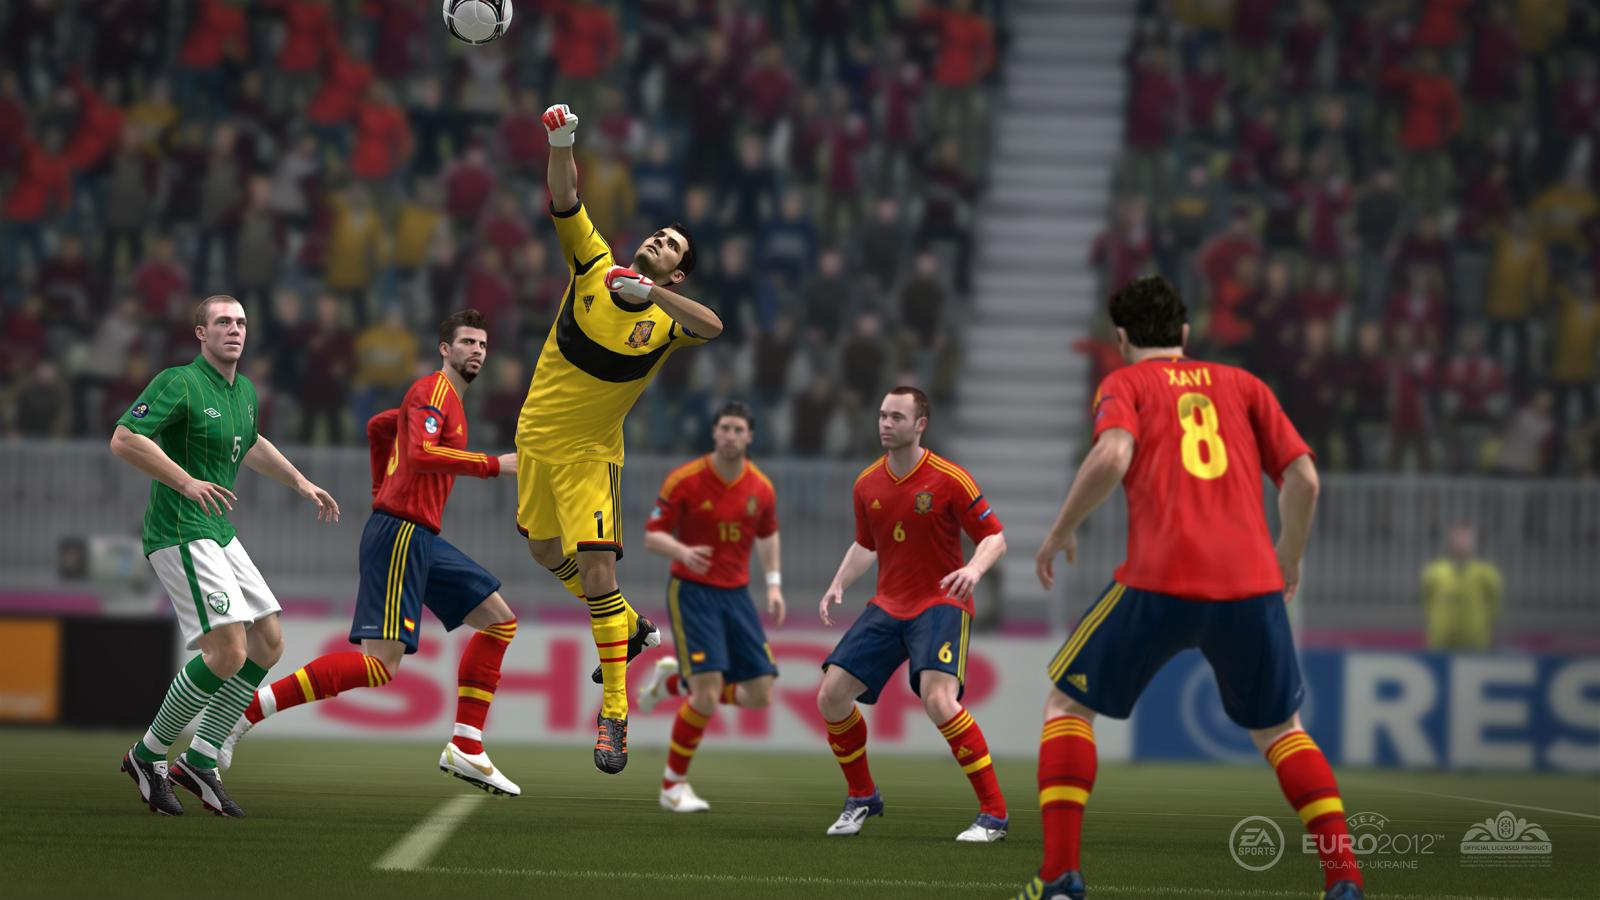 FIFA 2012 на Андроид: скачивайте футубол на свой планшет